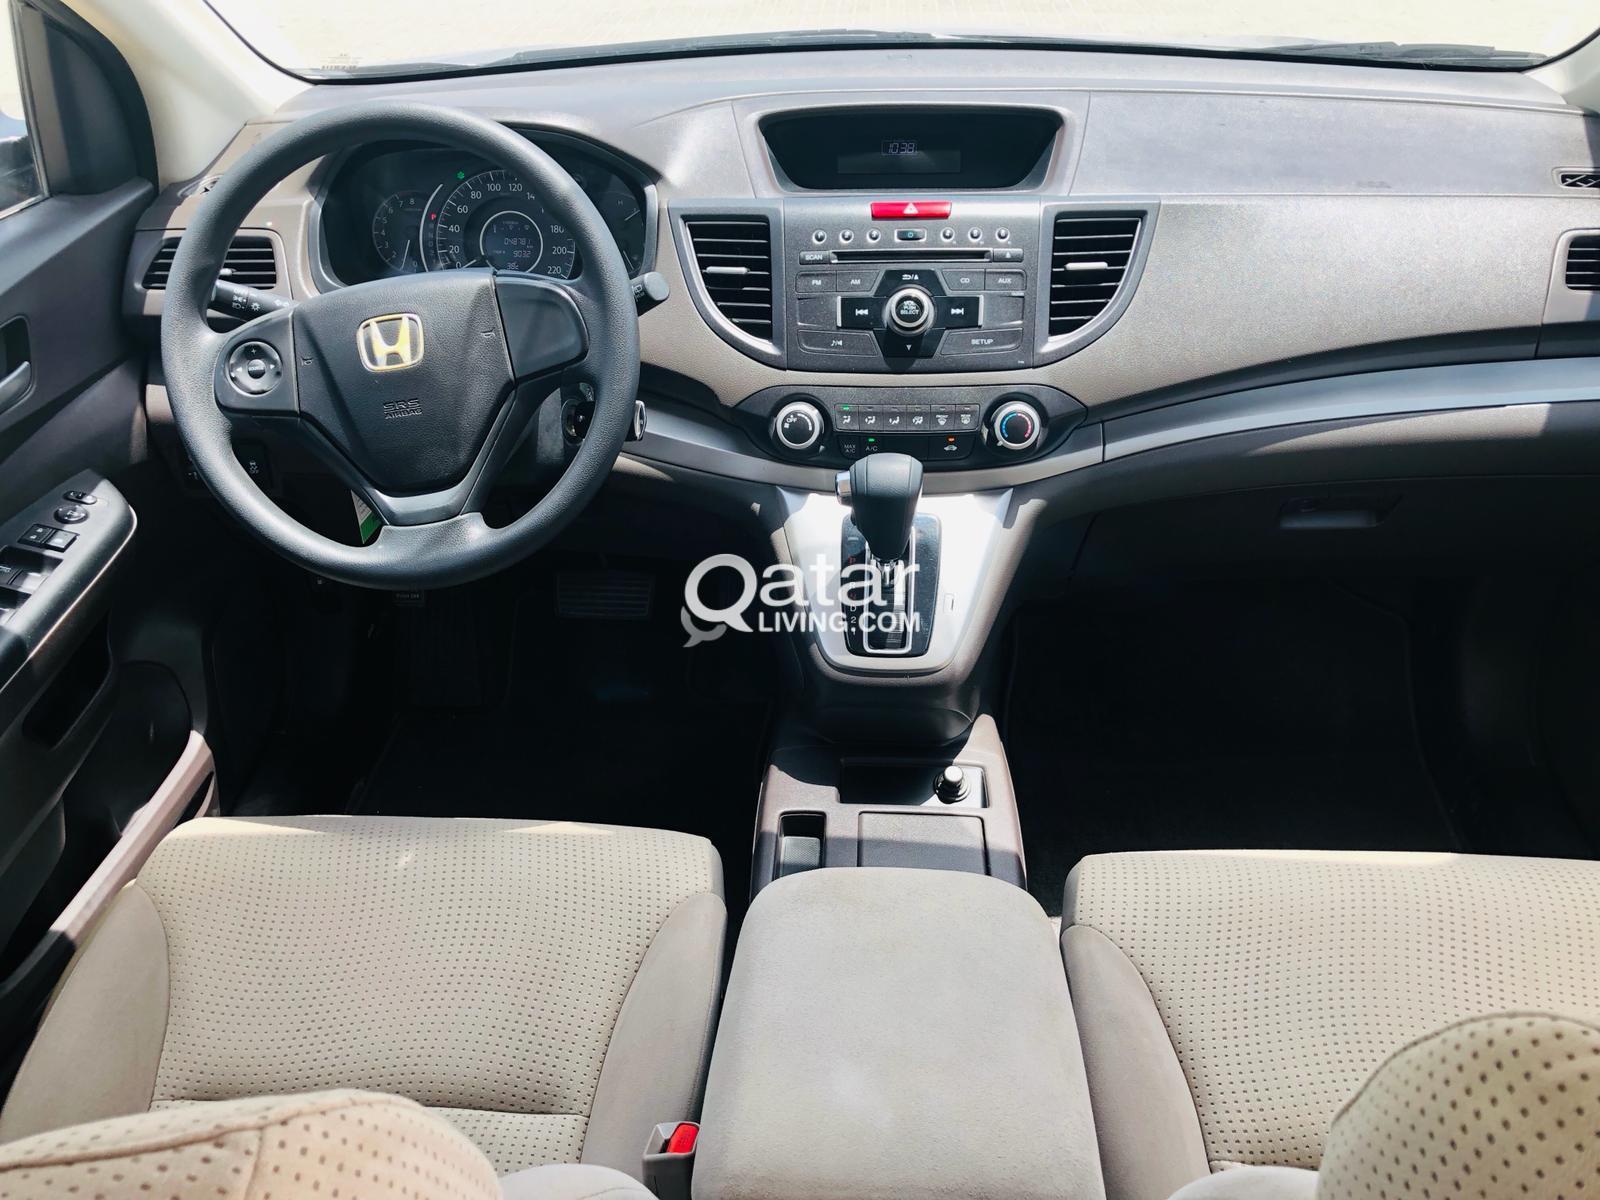 Honda CRV 2012 ( Original paint, Very low mileage )